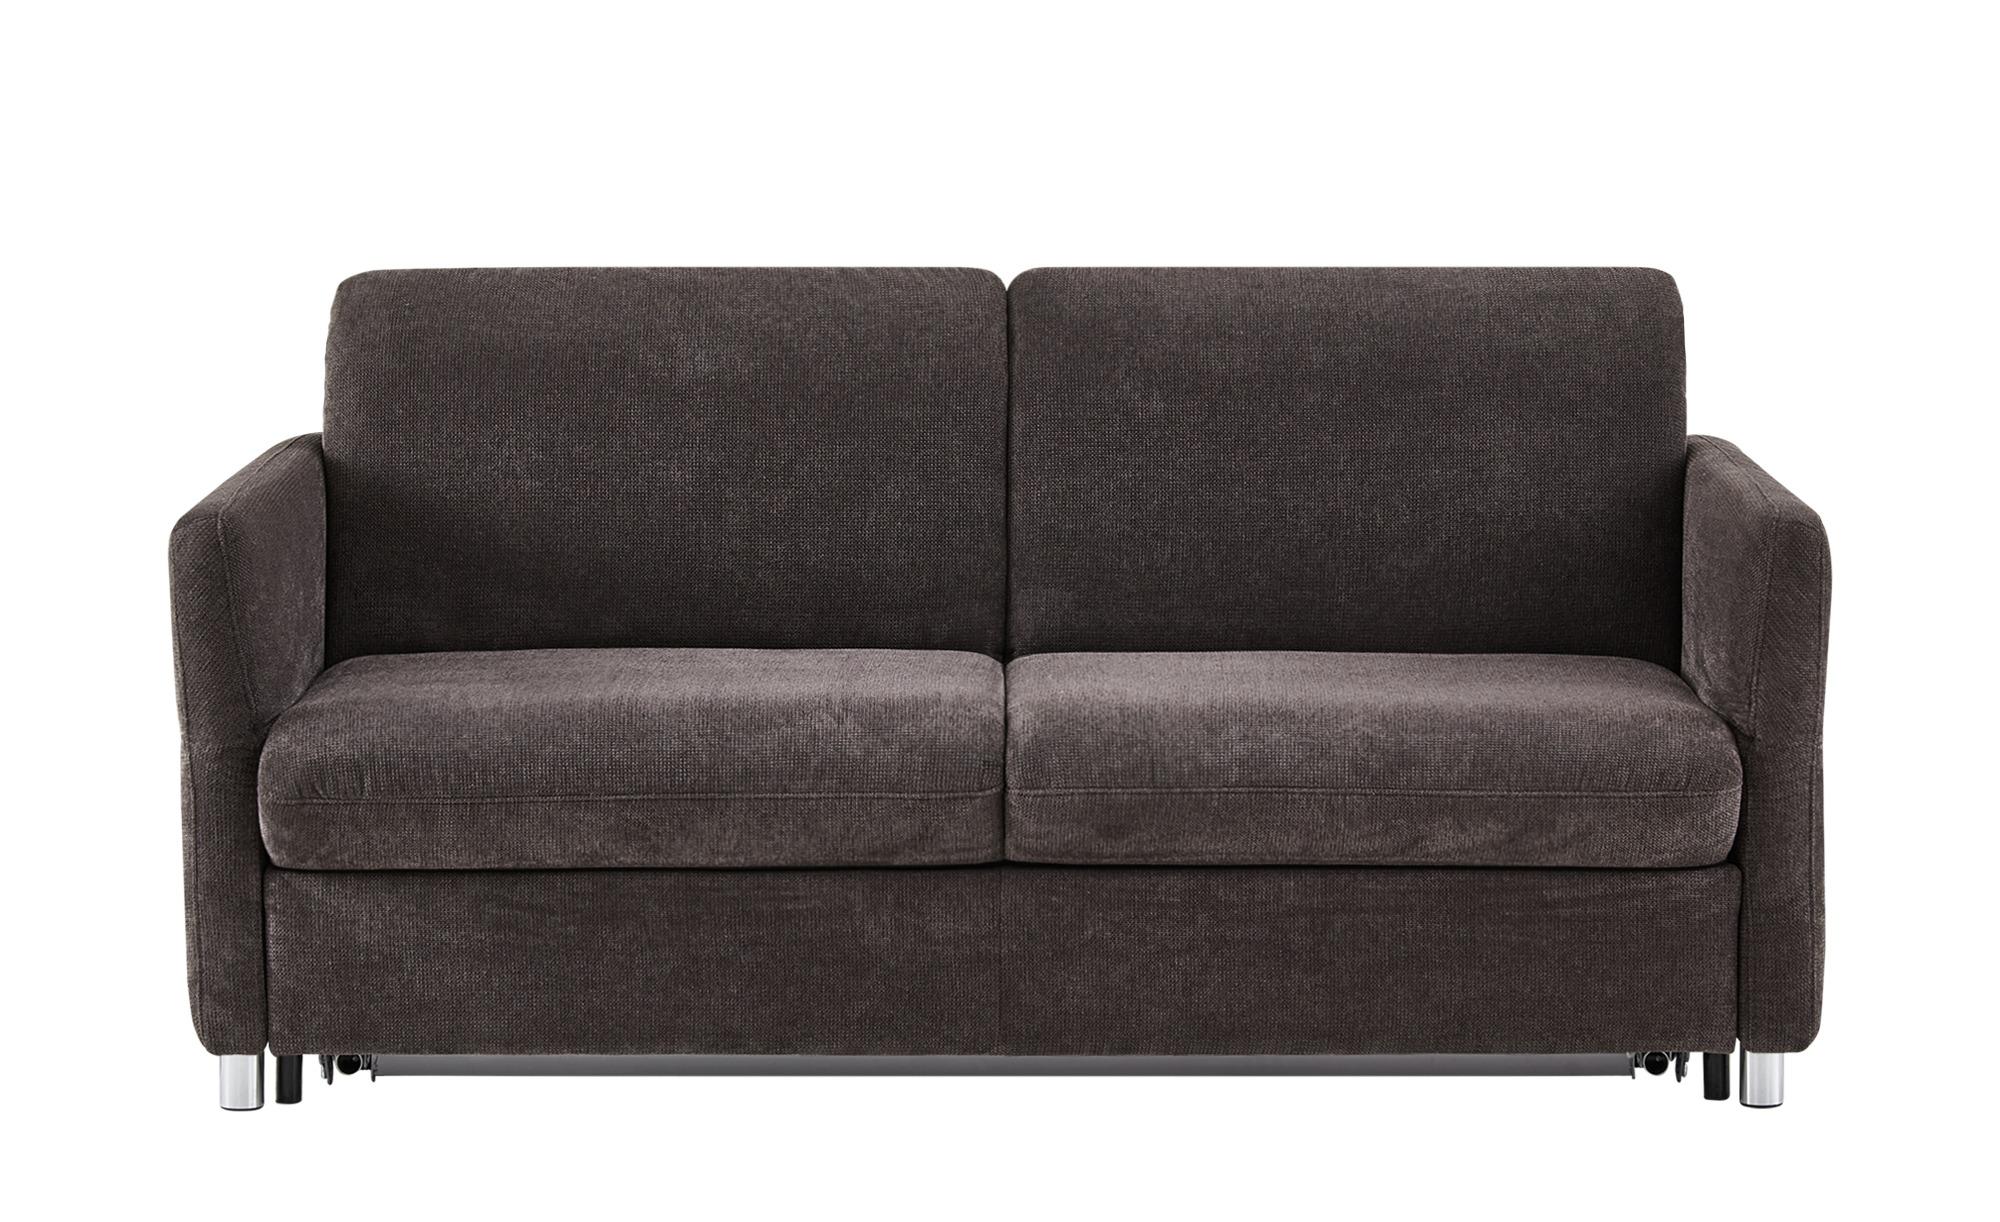 Schlafsofa grau - Flachgewebe Michaela Premium ¦ grau ¦ Maße (cm): B: 218 H: 90 T: 102 Polstermöbel > Sofas > 2-Sitzer - Höffner